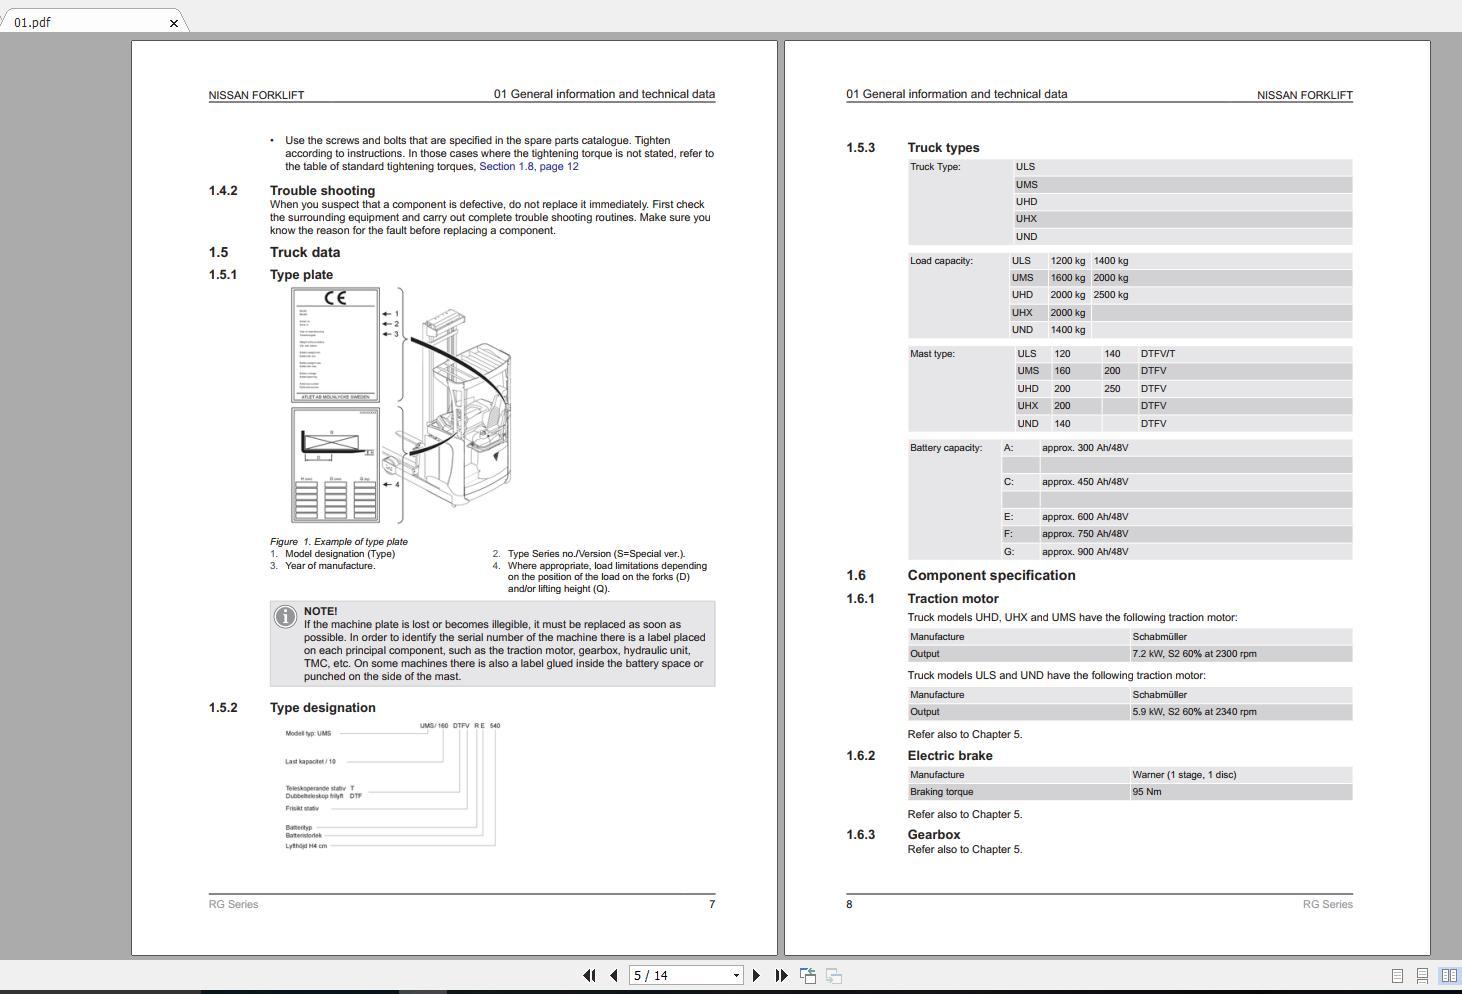 Nissan_Forklift_Warehouse_RG_Series_Service_ManualEN_2